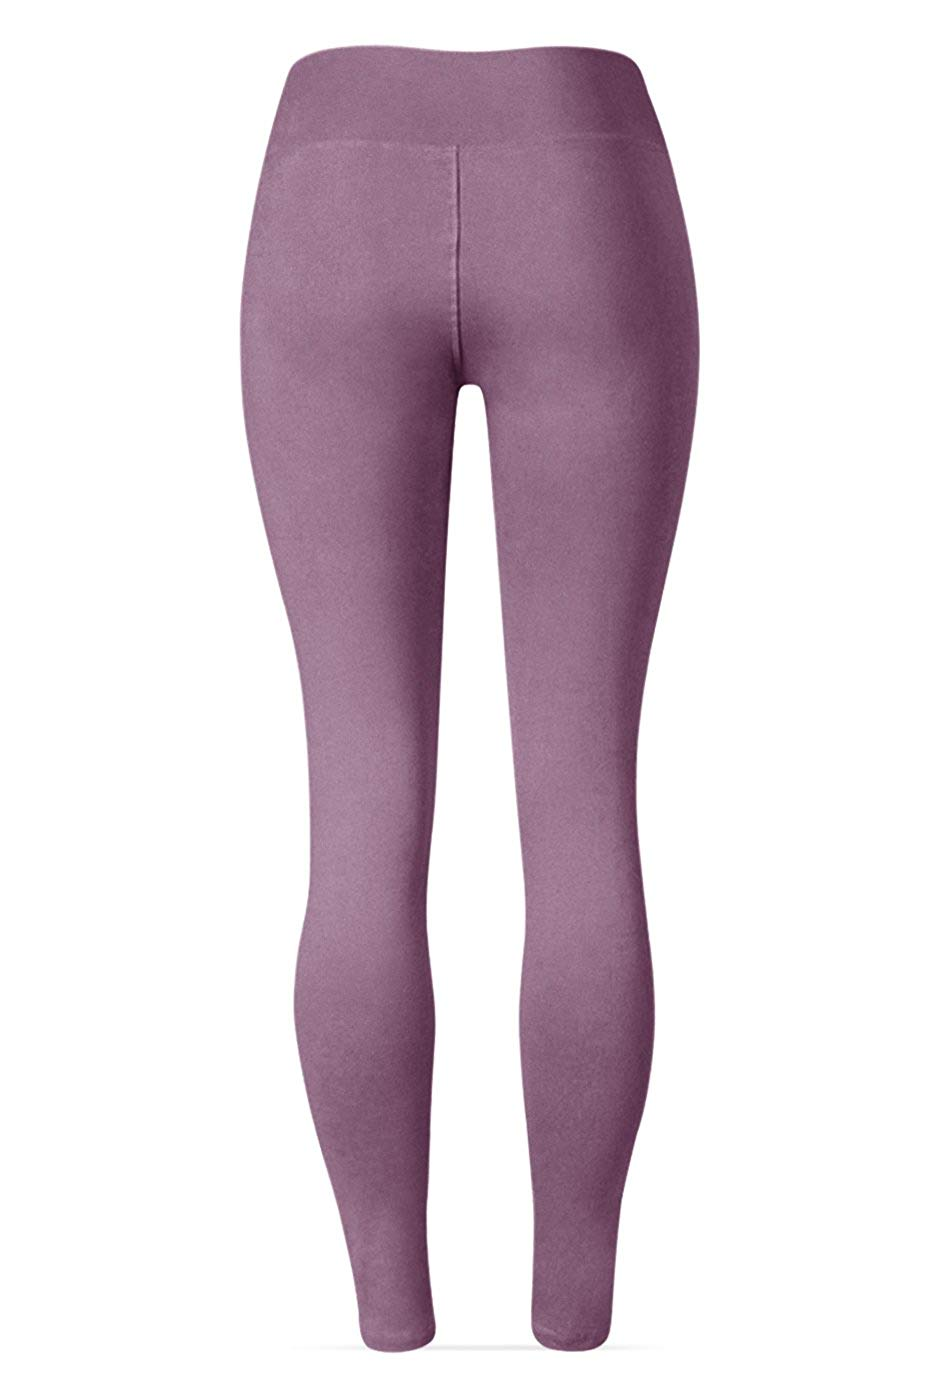 40 Pieces Waisted Leggings - 25 Colors - Super Soft Full Length Opaque Slim2019 CoolMax  Silk  Cotton